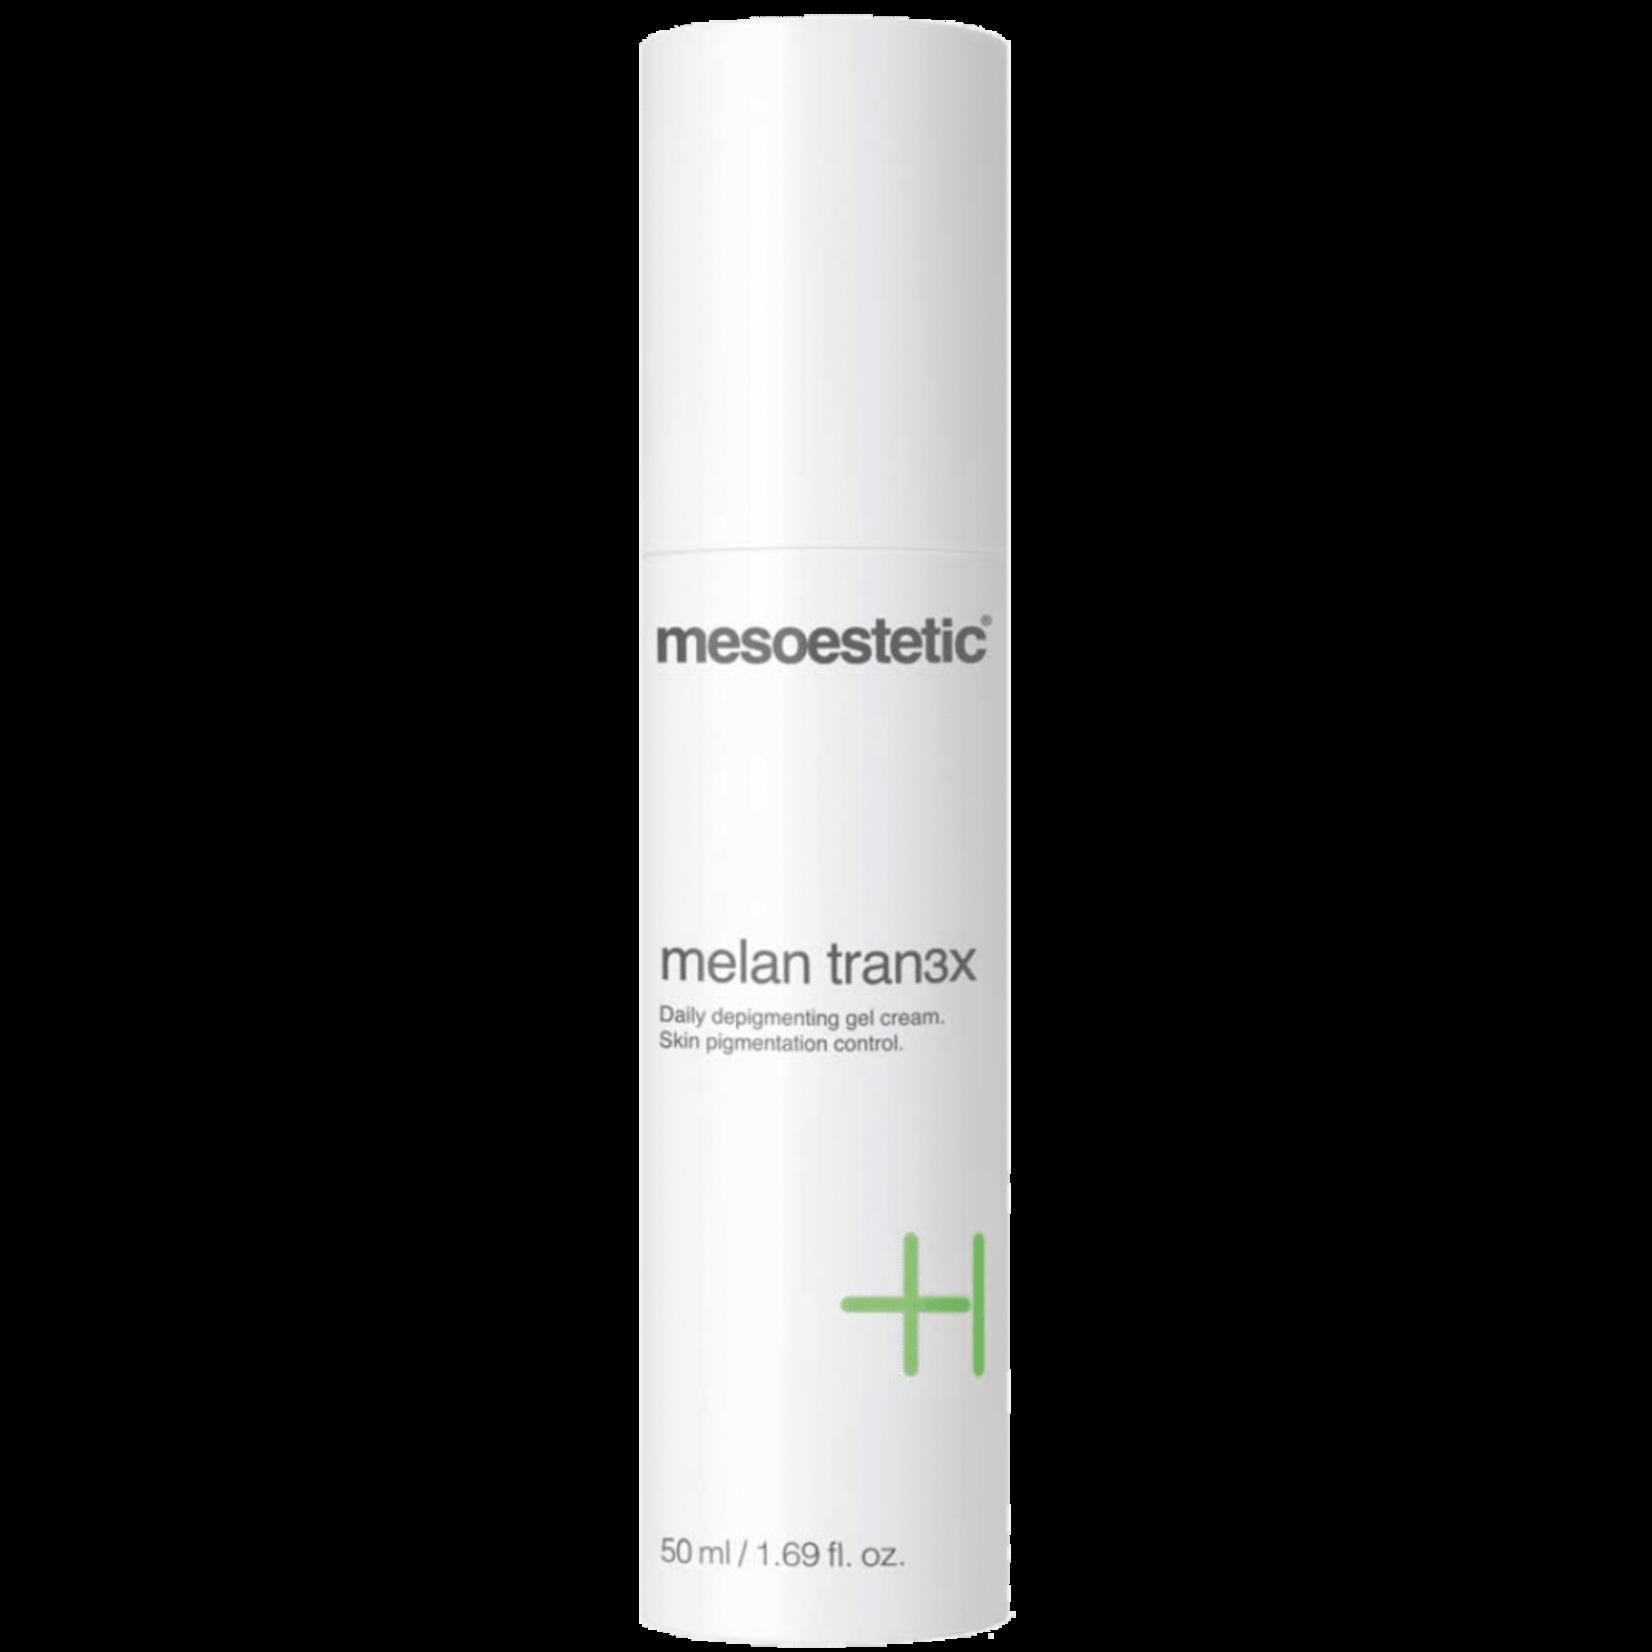 Mesoestetic Depigmenterende gelcrème Melan tran3x